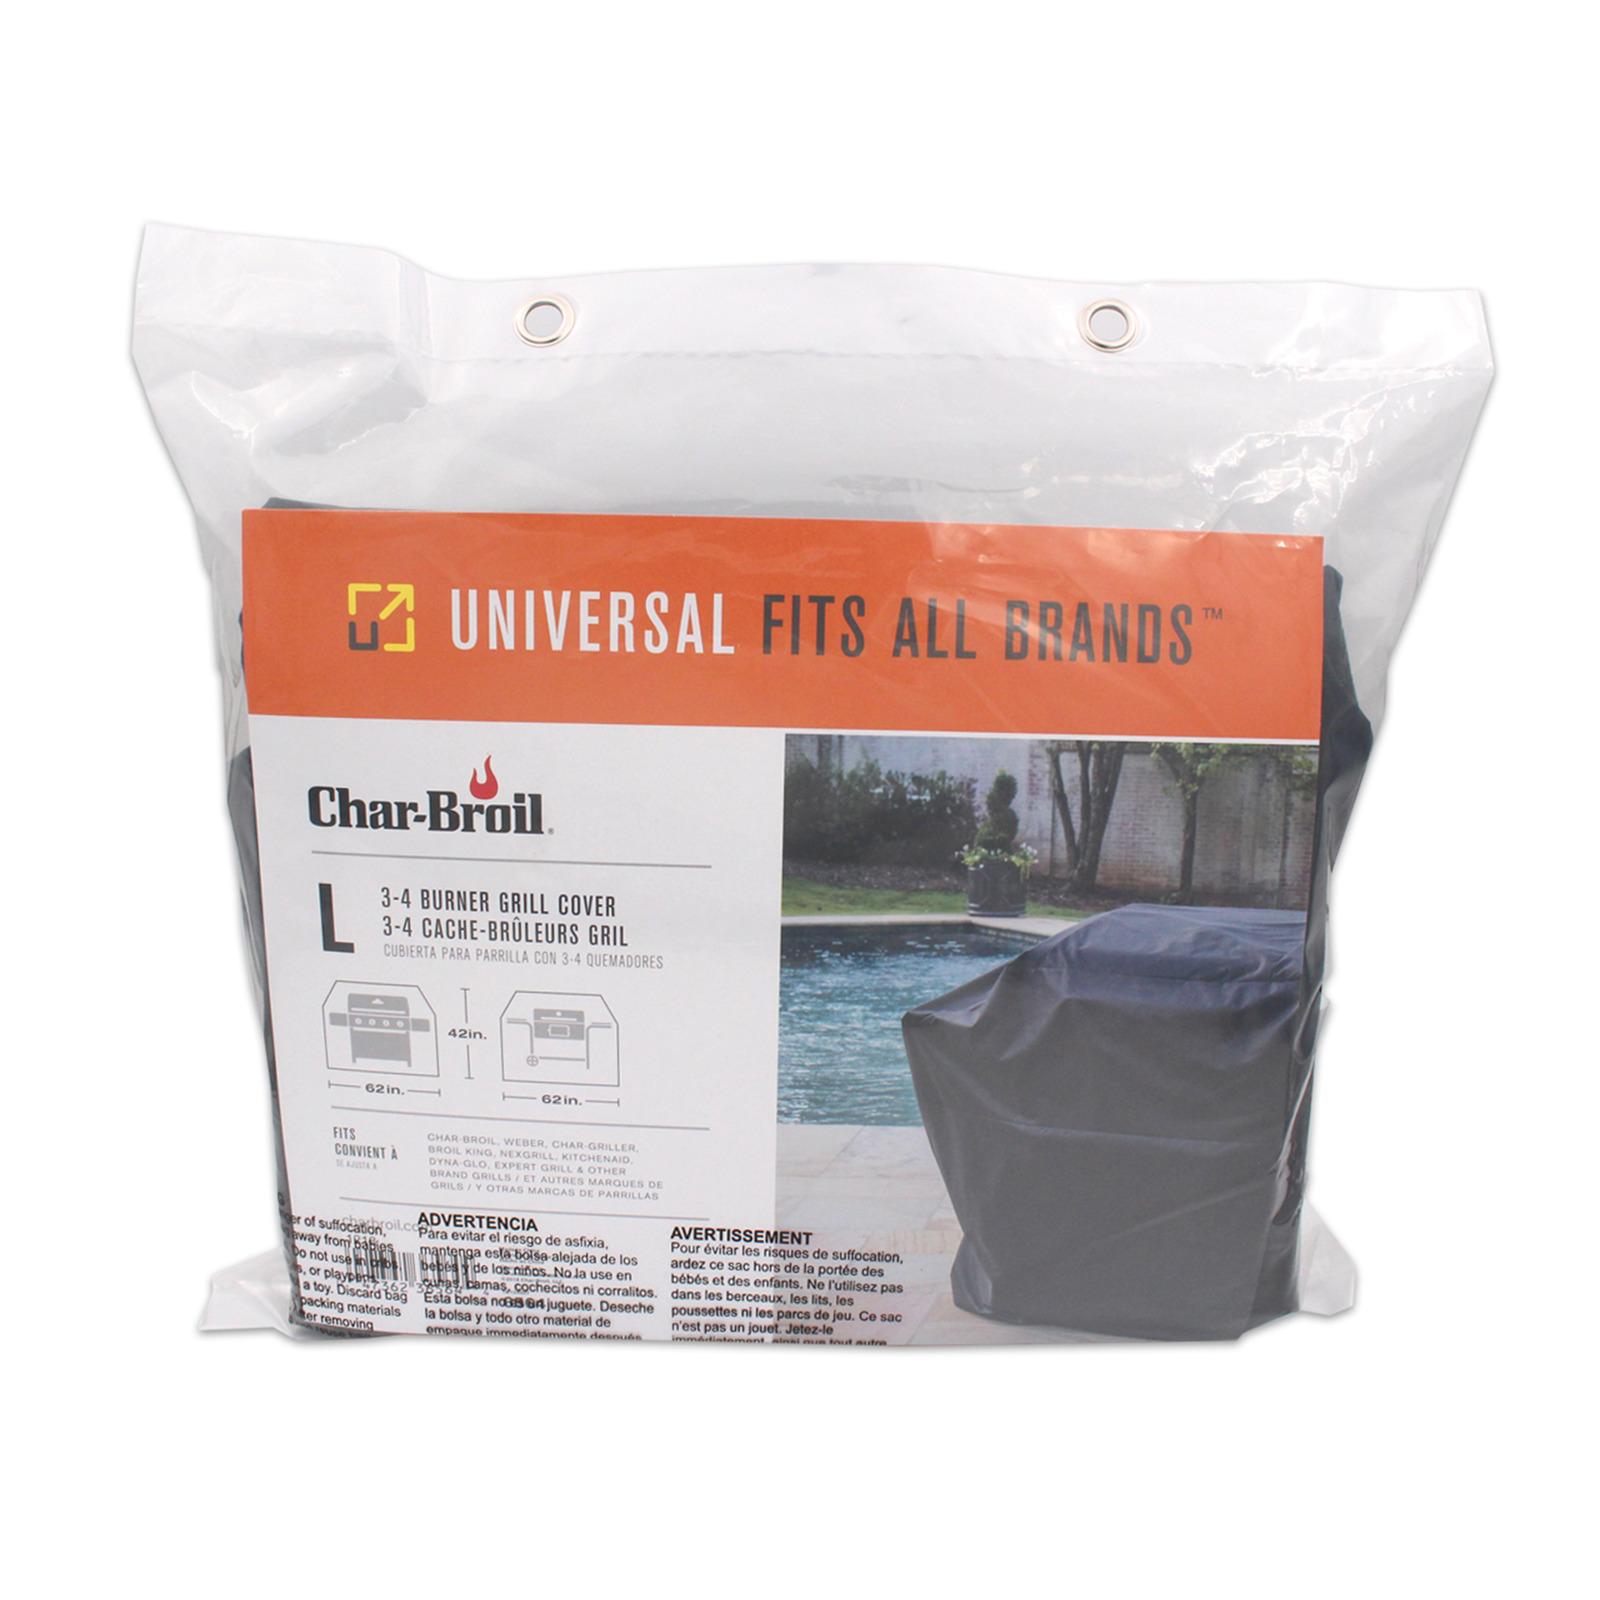 Char-Broil Universal 2 Burner Basic Grill Cover (Medium)